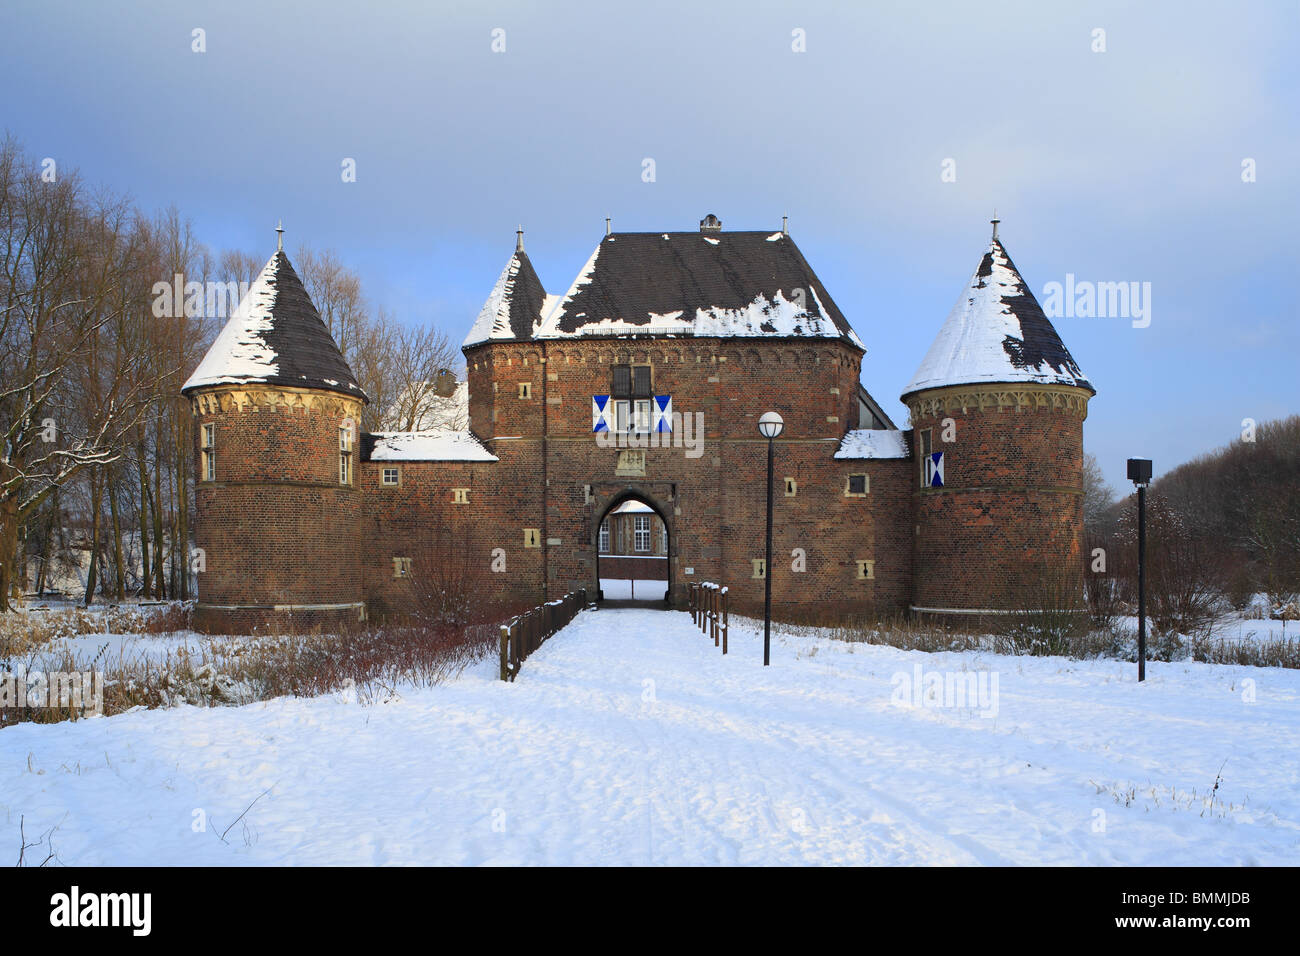 D-Oberhausen, Ruhr area, Lower Rhine, North Rhine-Westphalia, D-Oberhausen-Osterfeld, Castle Vondern, moated castle, - Stock Image